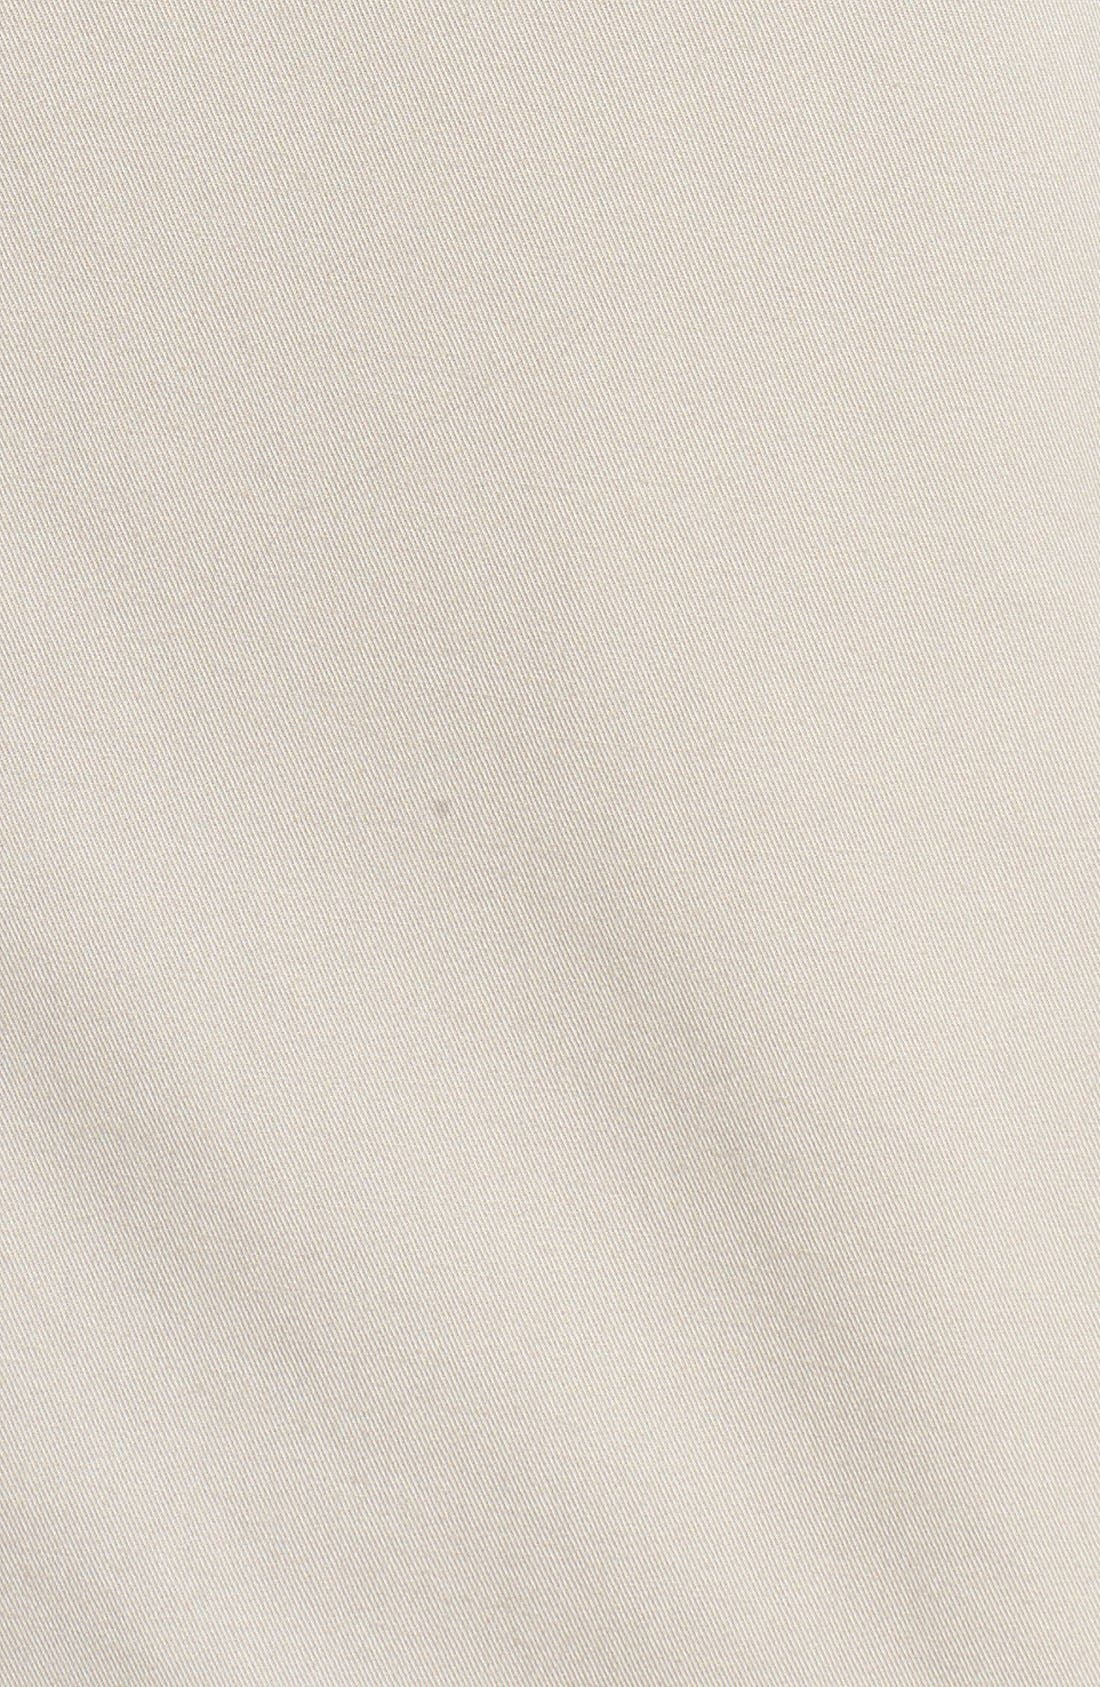 Trim Fit Stretch Cotton Blazer,                             Alternate thumbnail 5, color,                             Tan